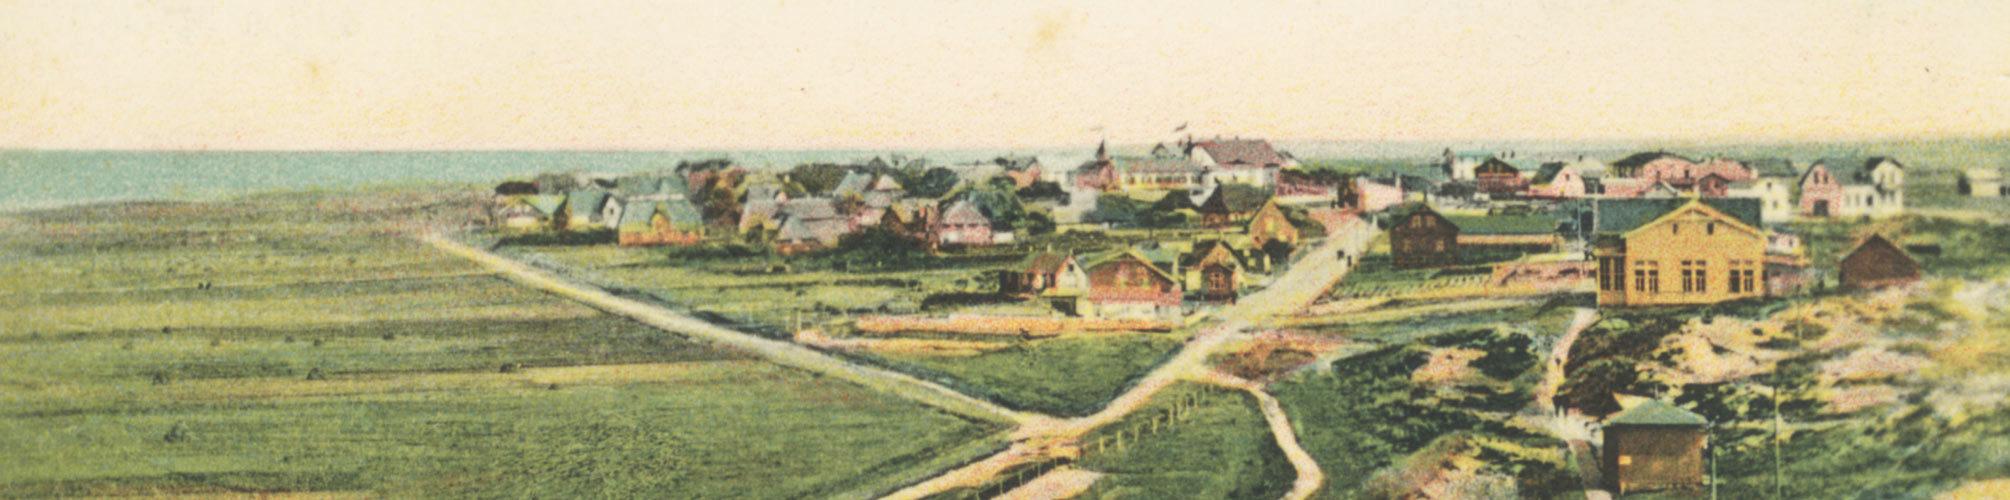 hotel-pension-uetjkiek-historisch-norddorf